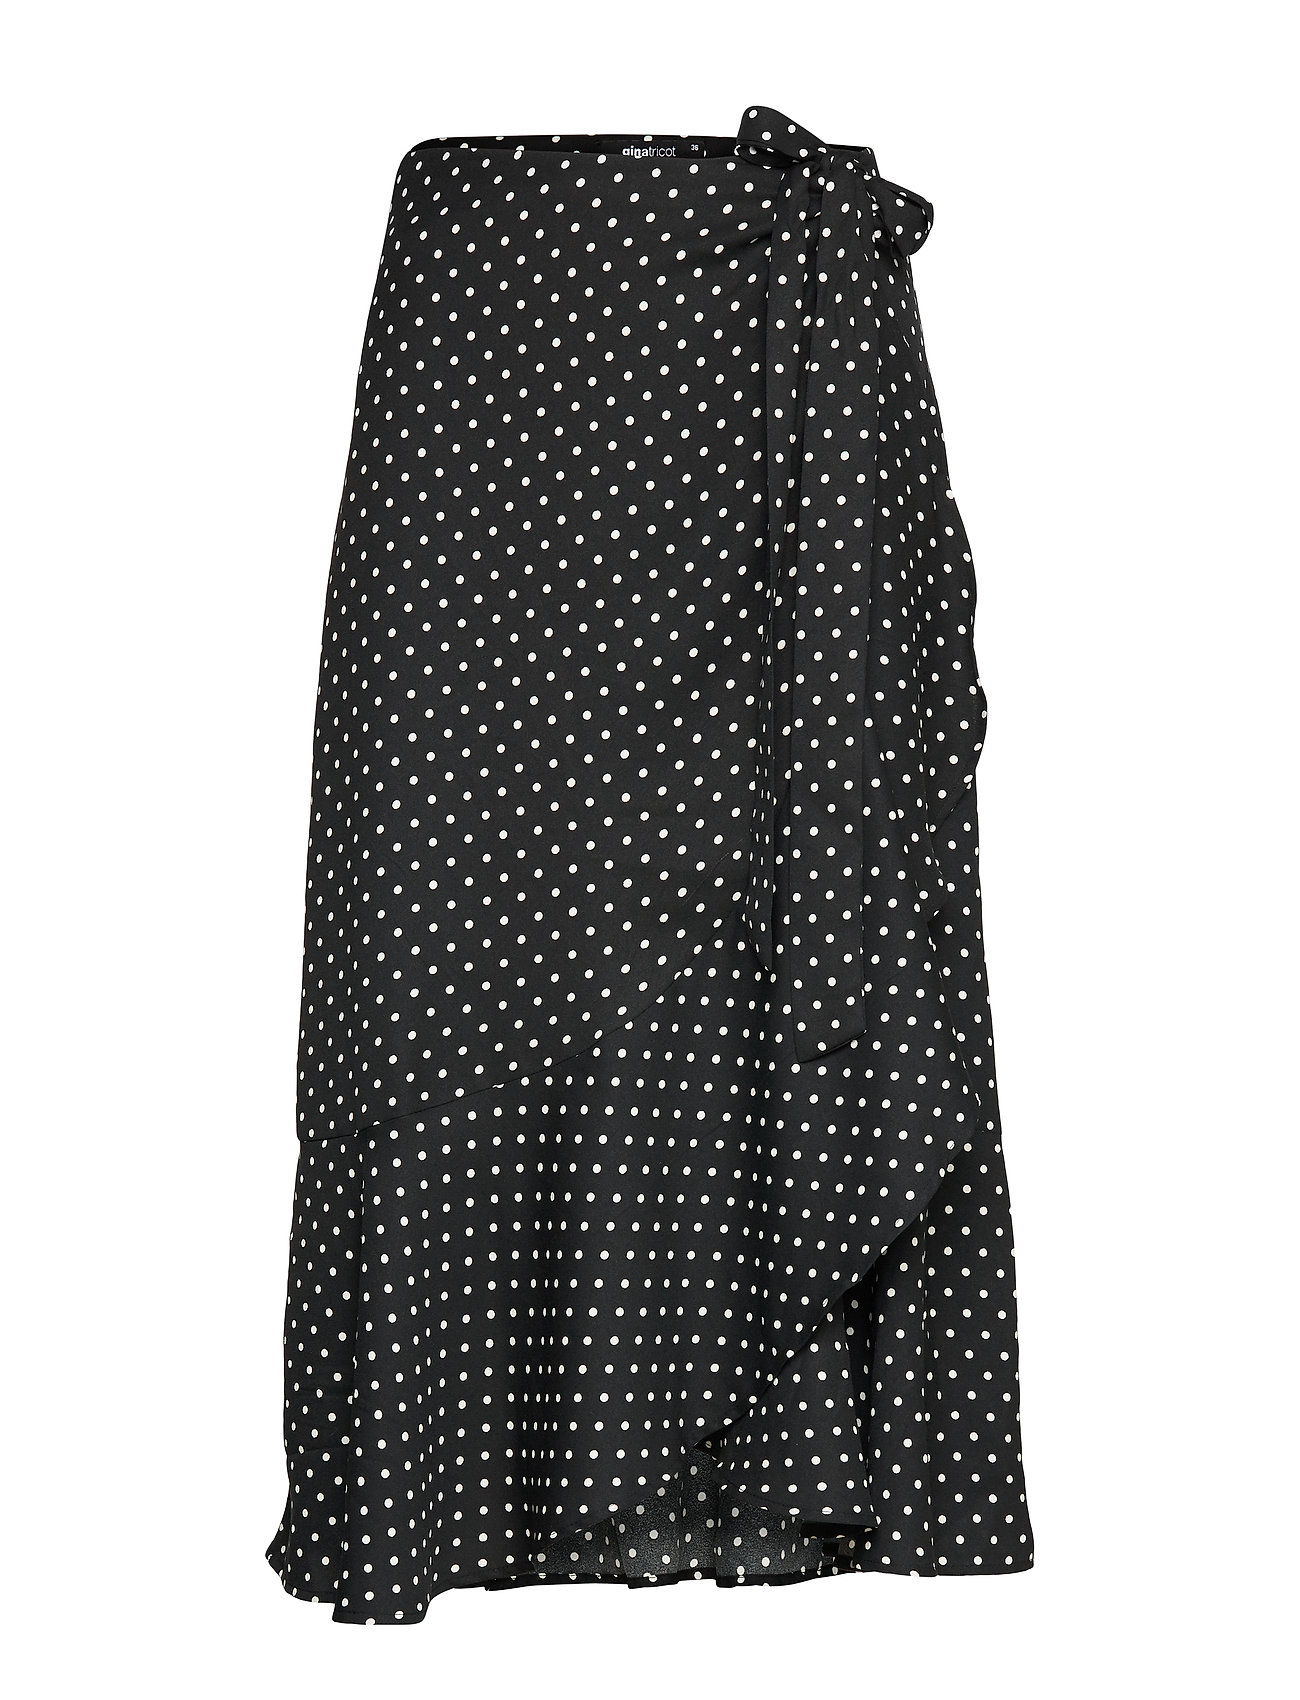 Gina Tricot Fran wrap skirt - BLACK/WHITE DOT